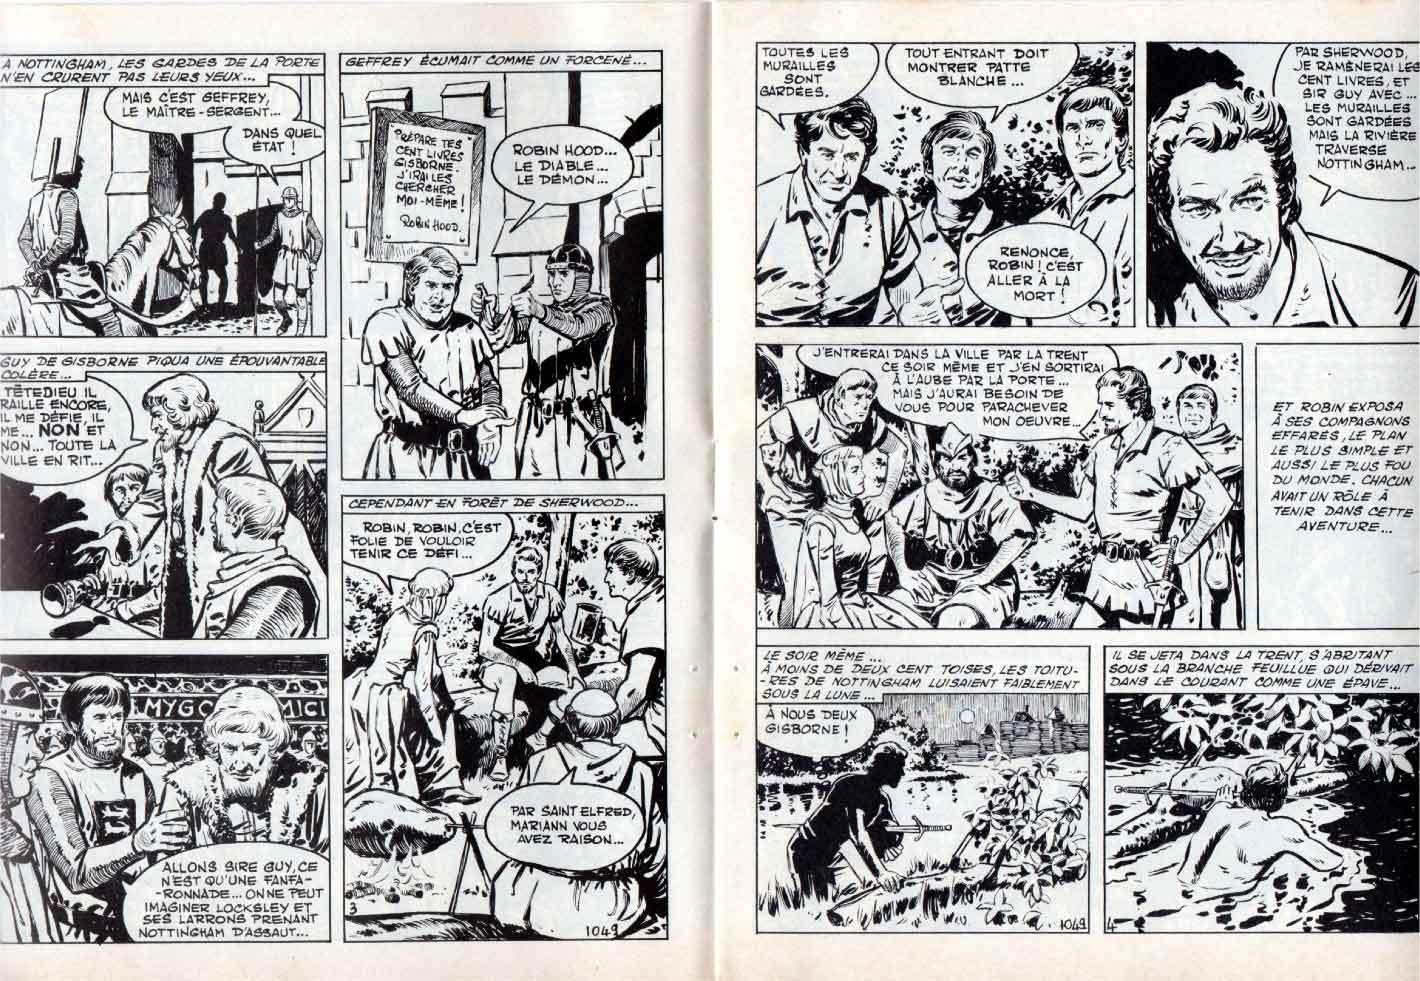 « Robin des bois » Vaillant n° 1049 (02/06/1965).